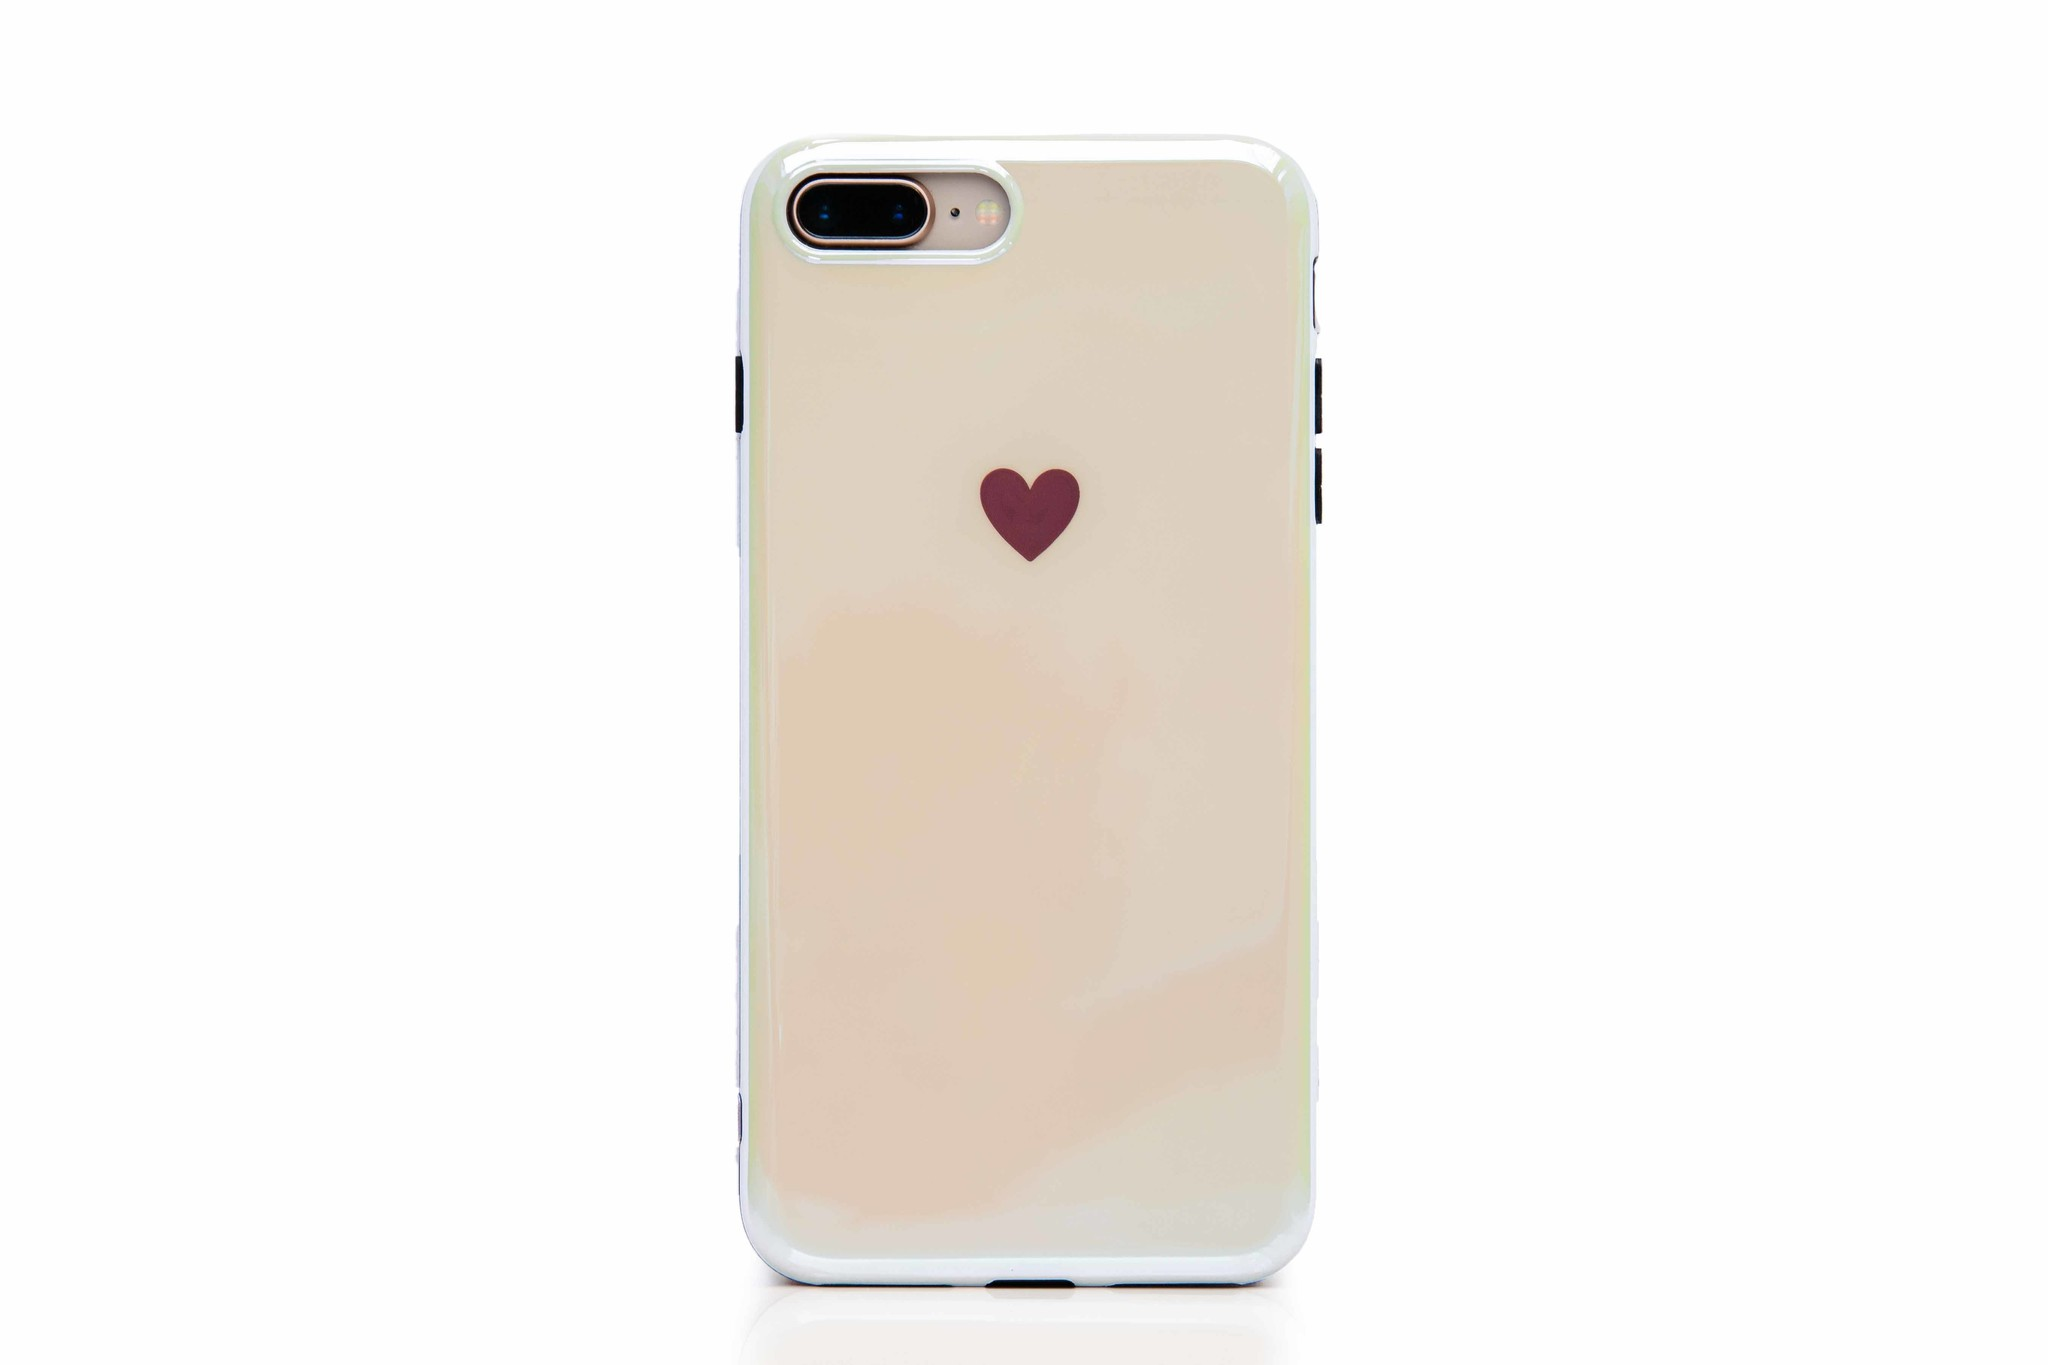 Smartphonehoesje iPhone 7 plus / 8 plus | Effen kleur met hartje | Shiny white